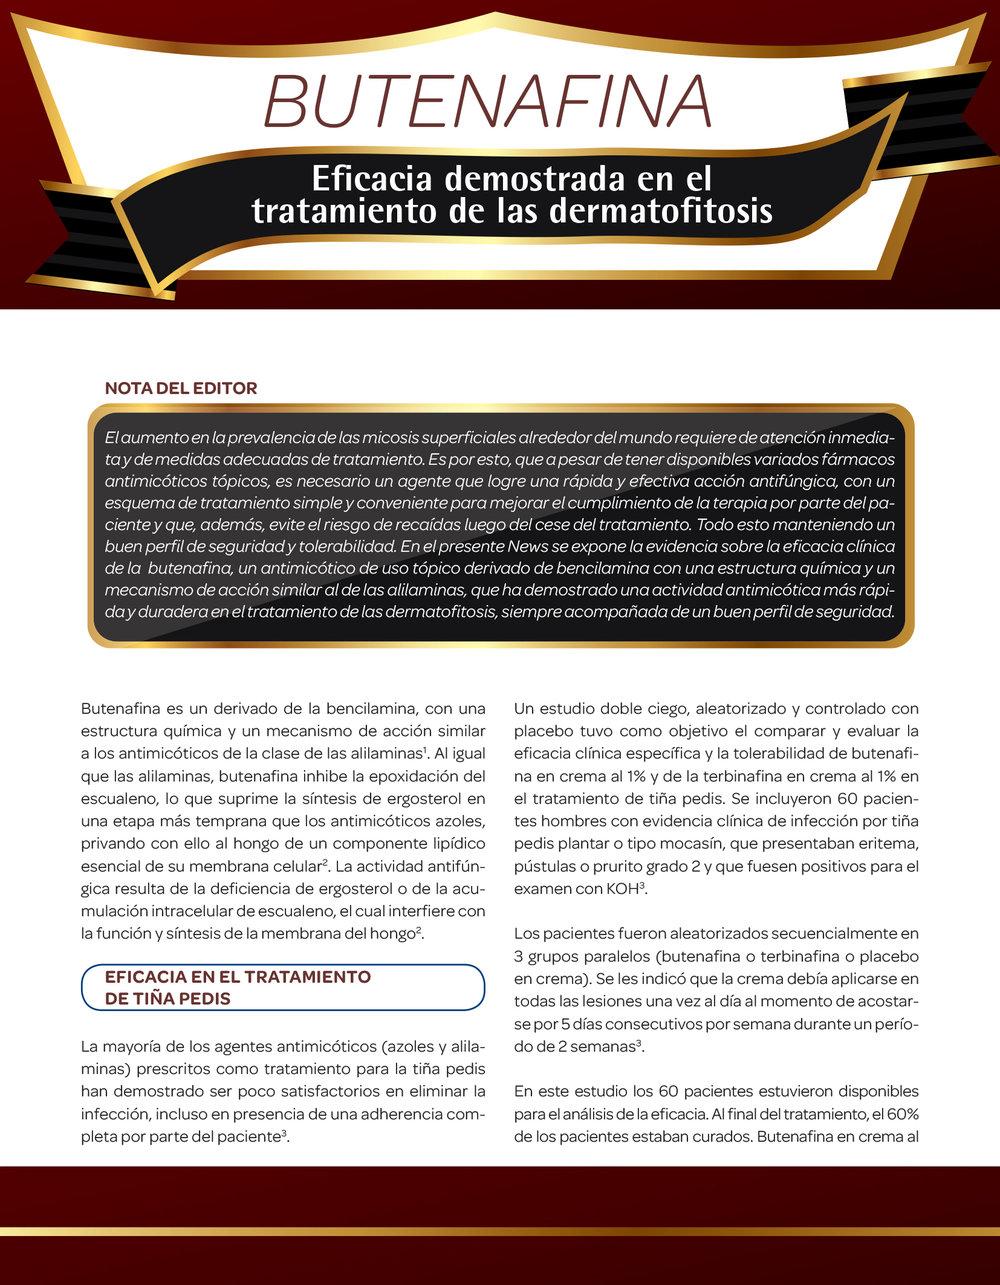 Butemax_DIPTICO FINAL V 15-1.jpg